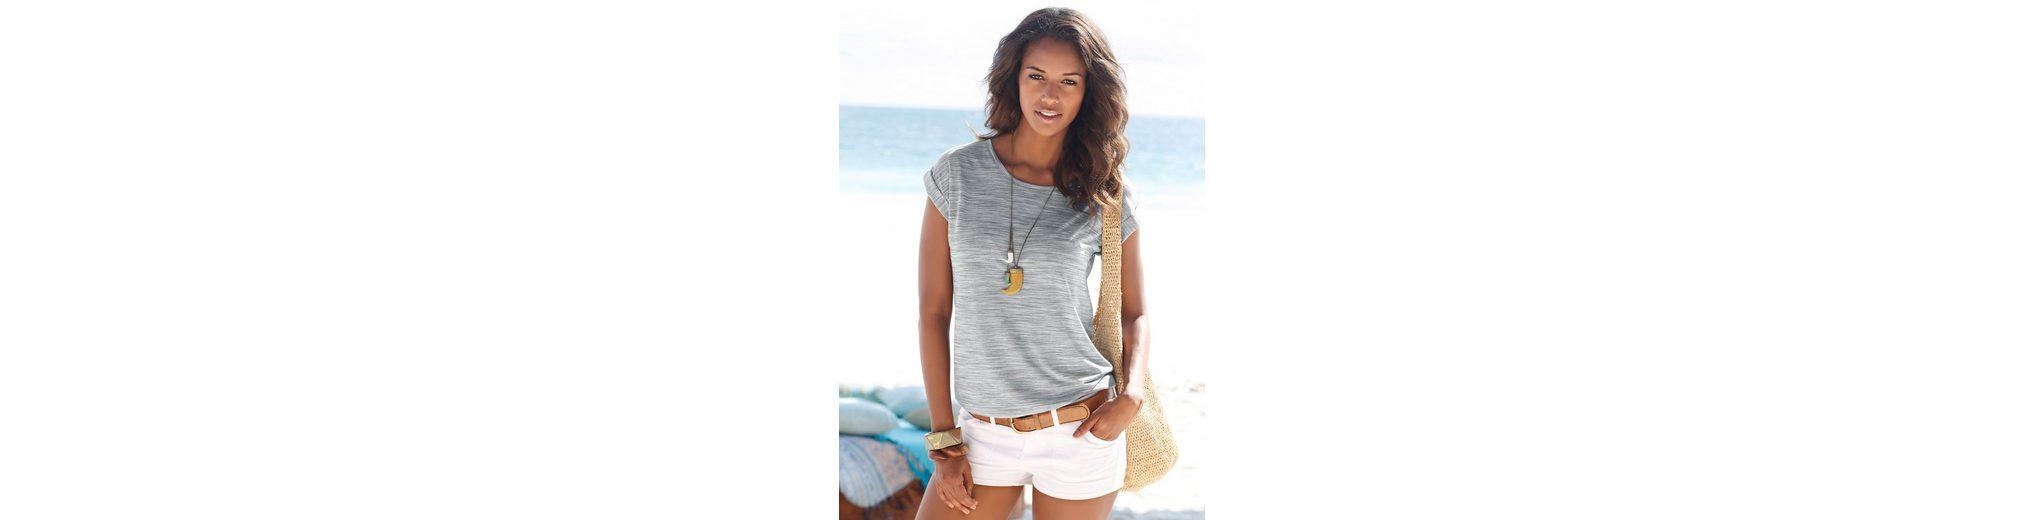 Beachtime melierte T-Shirts (2 Stück) Online Günstig Online Austritt Ansicht Online Günstiger Preis Bestseller Günstiger Preis Billig Beliebt 3ahA3eUrzv